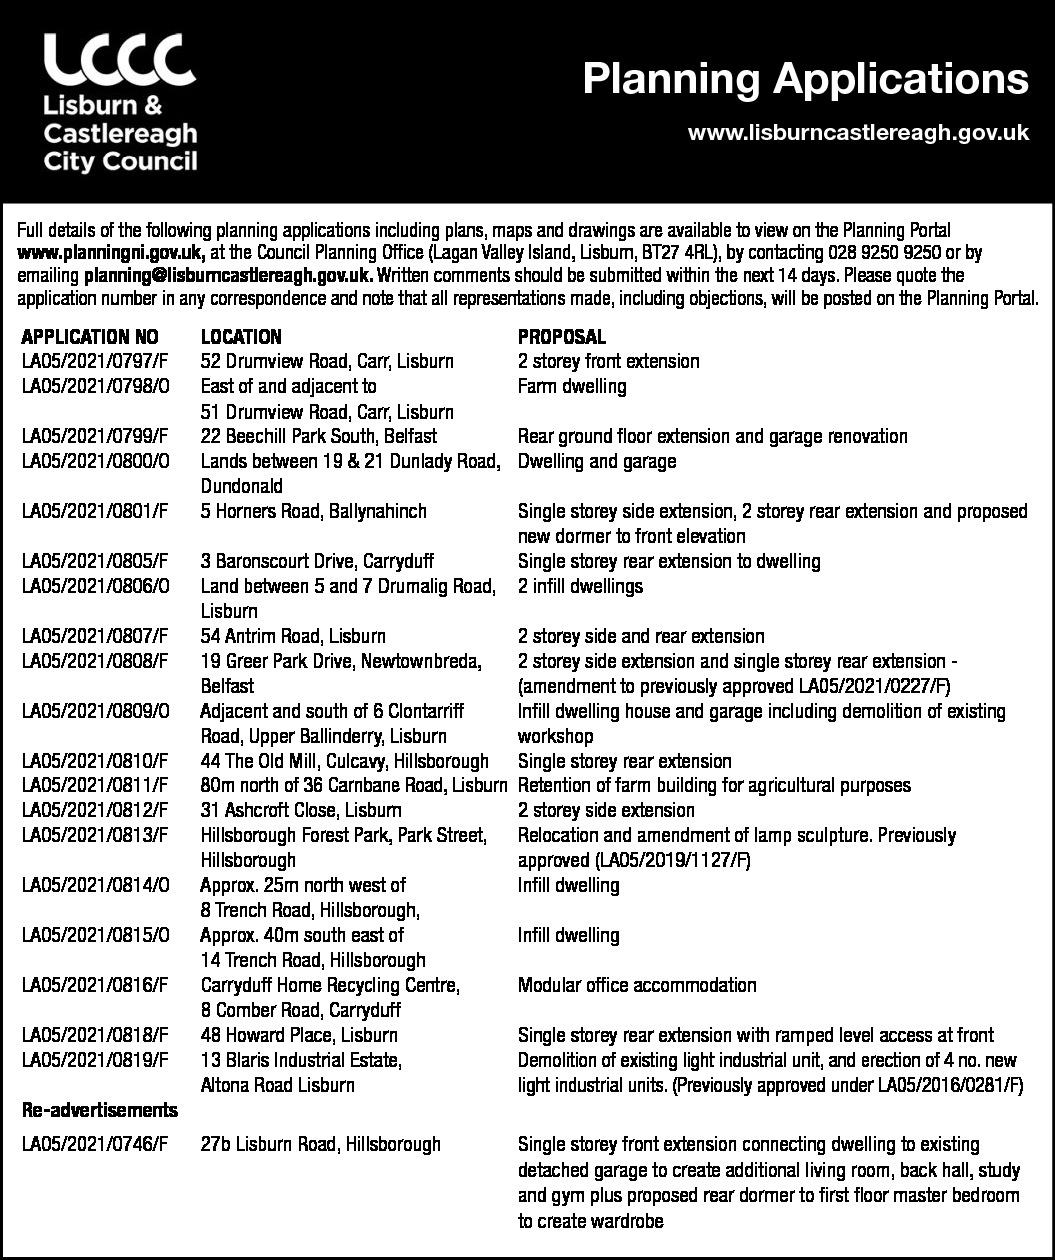 Lisburn & Castlereagh City Council Planning Applications